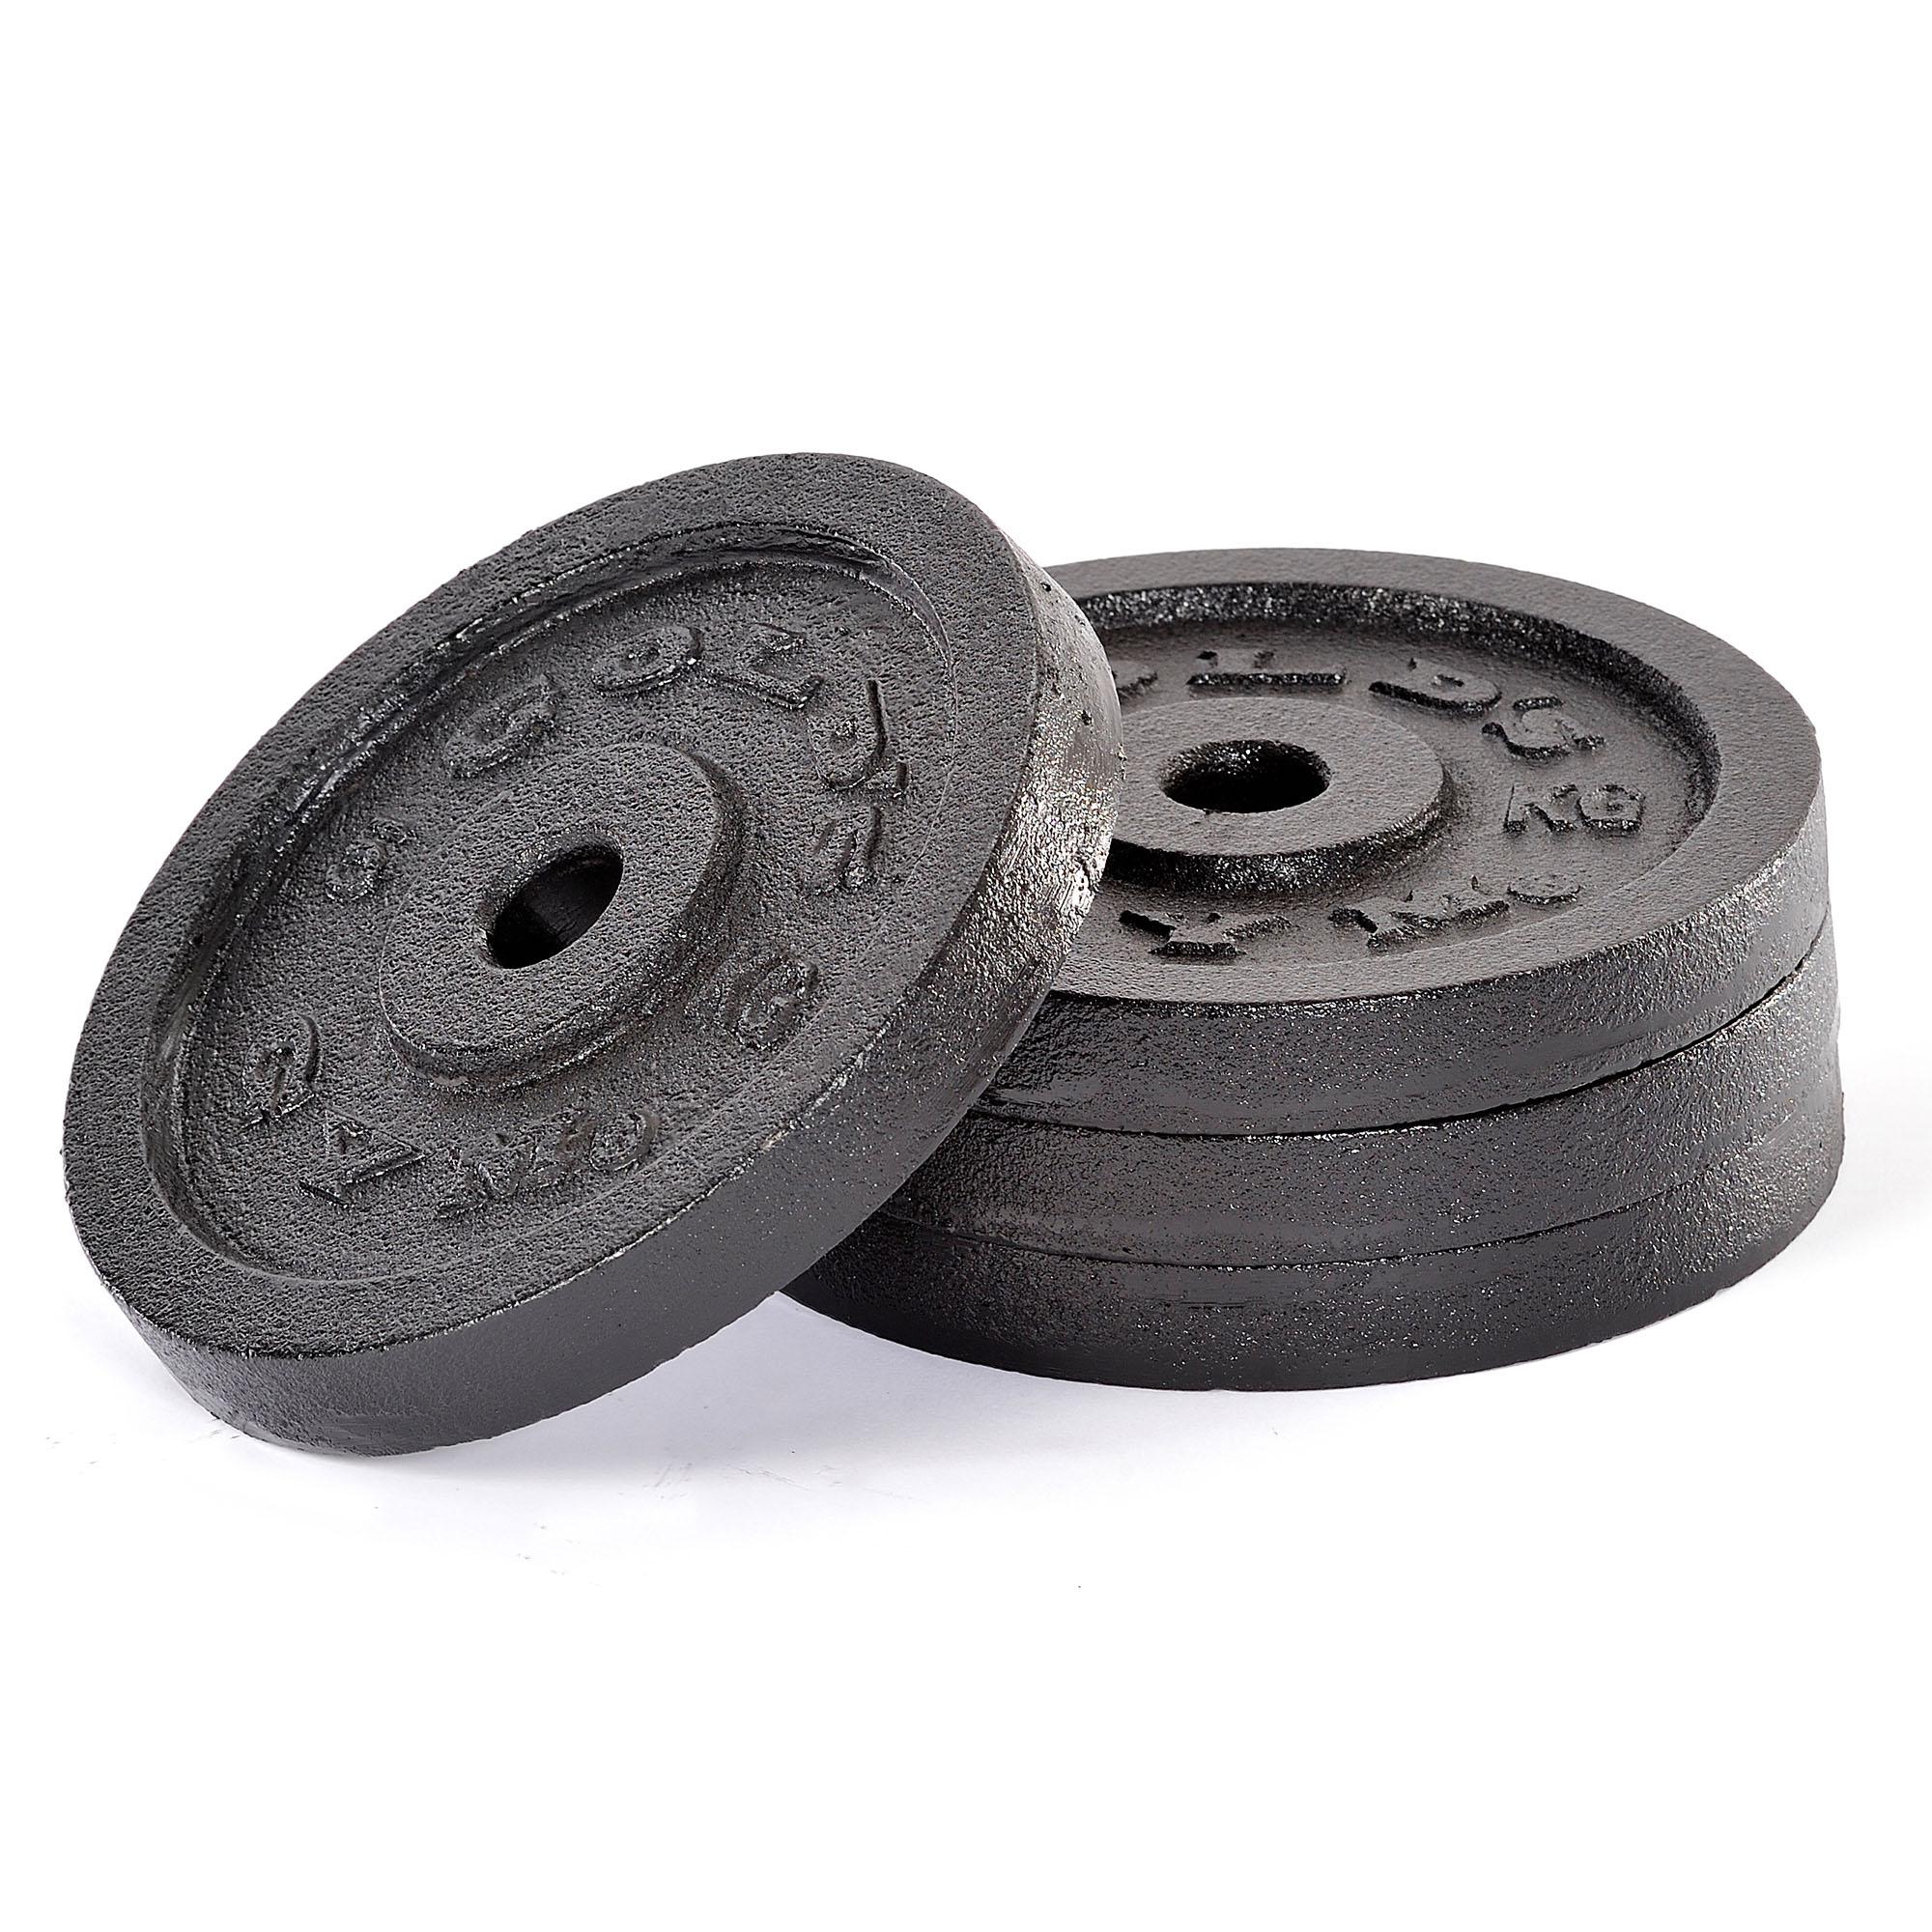 Fitness Equipment Golds Gym 4 x 5kg Cast Iron Standard Weight Plates